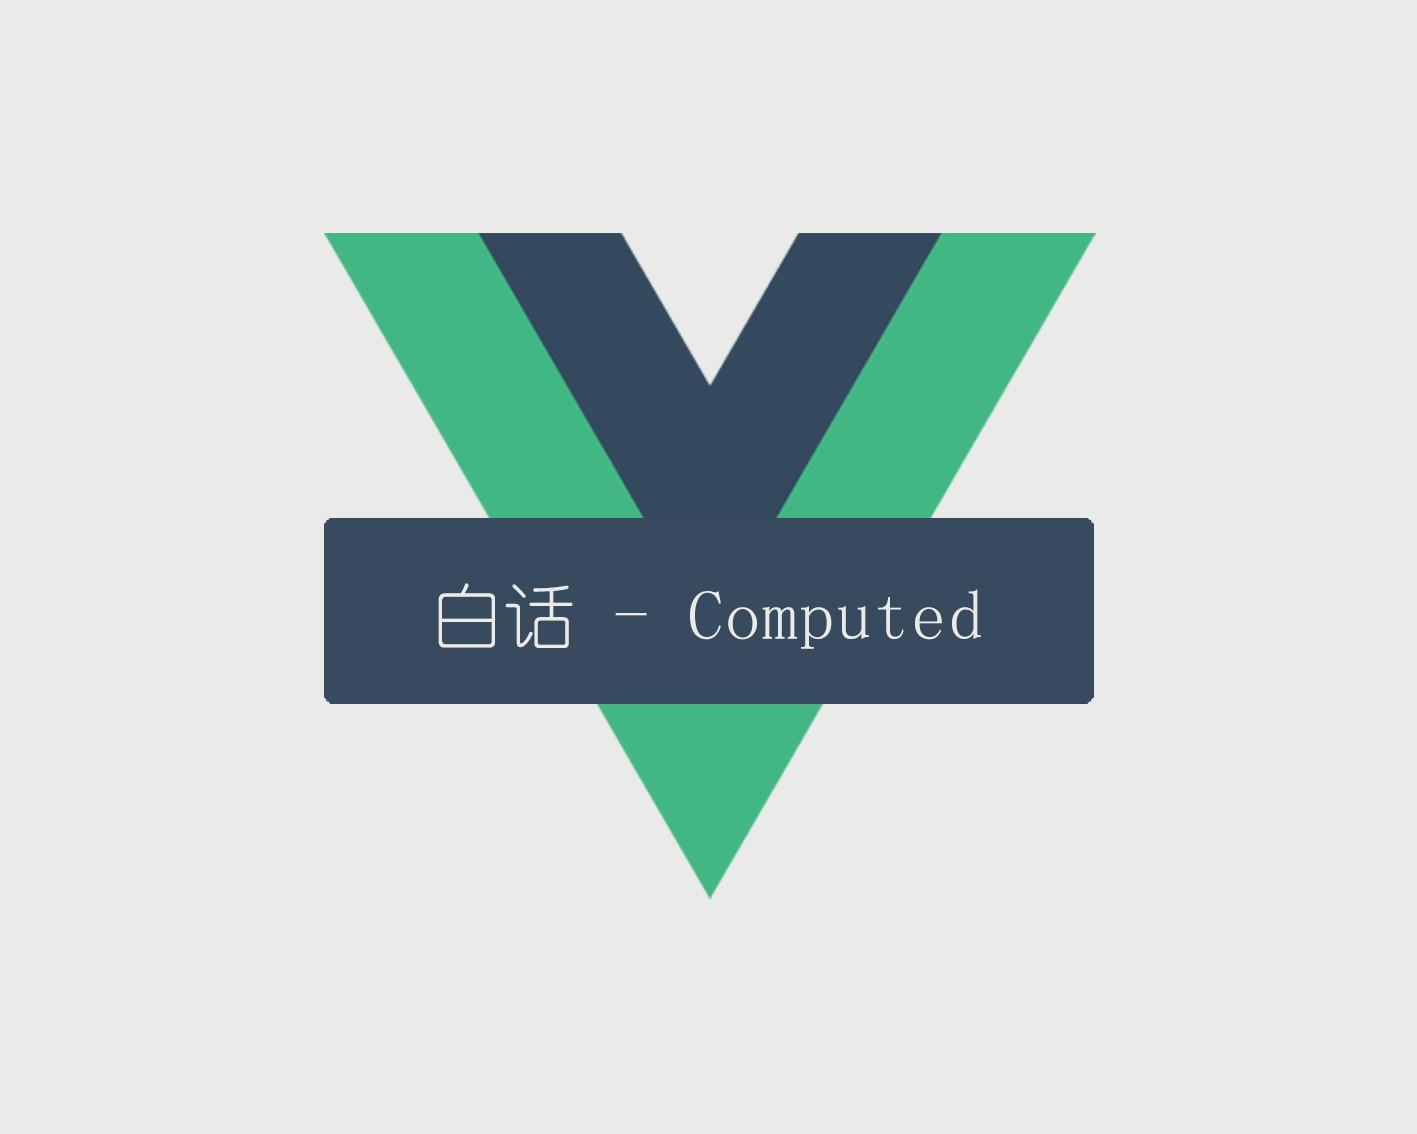 【Vue原理】月老Computed - 白话版